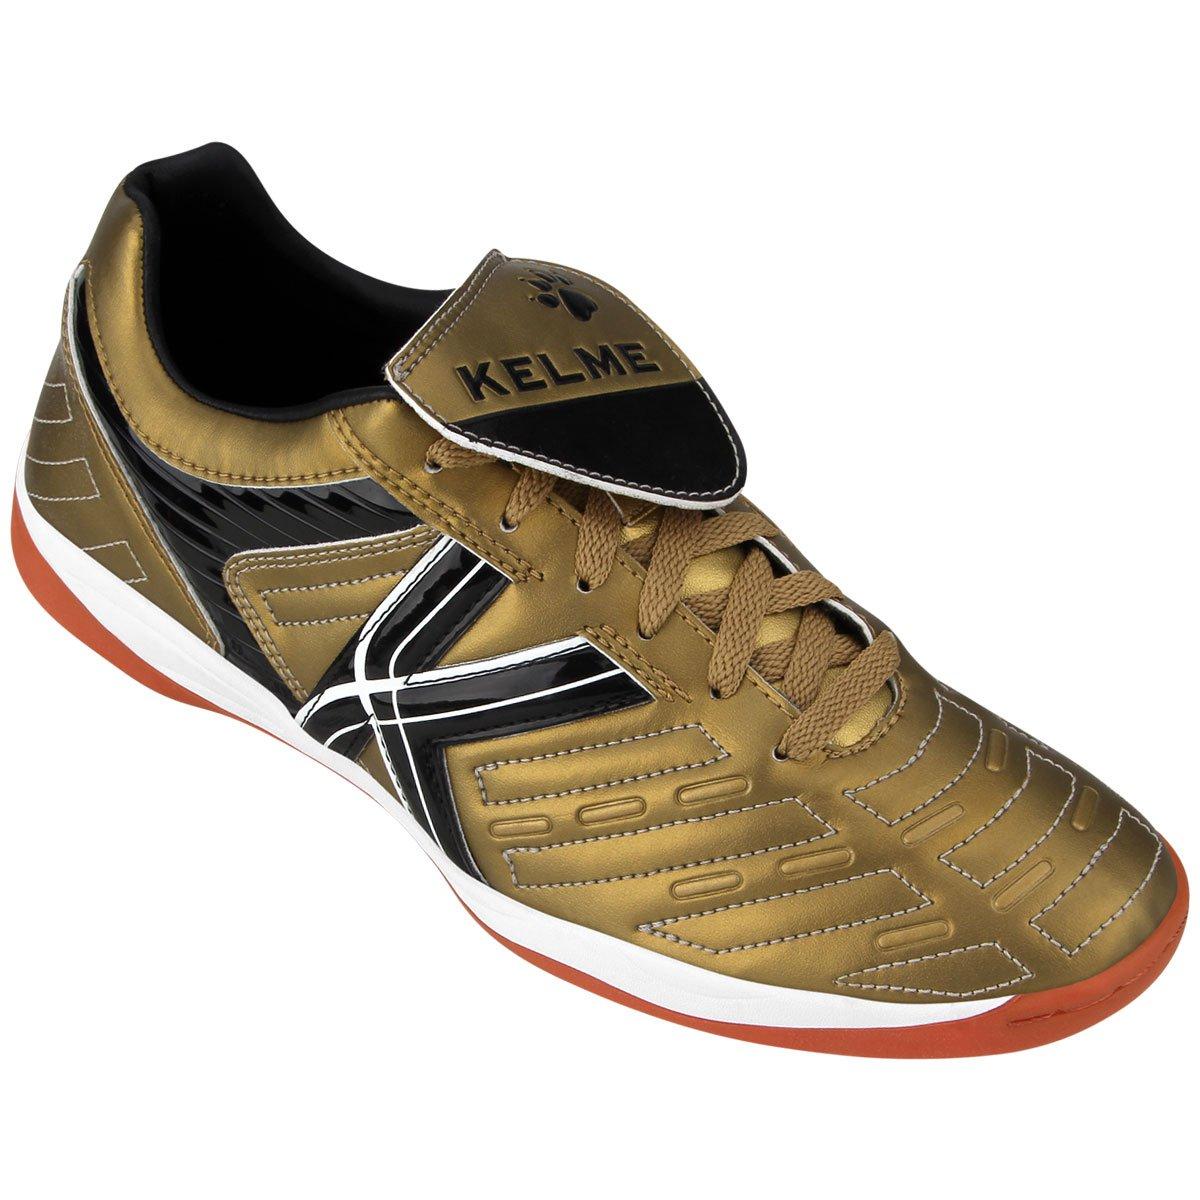 c79a45b7b31 ... Chuteira Kelme Tacchi Futsal